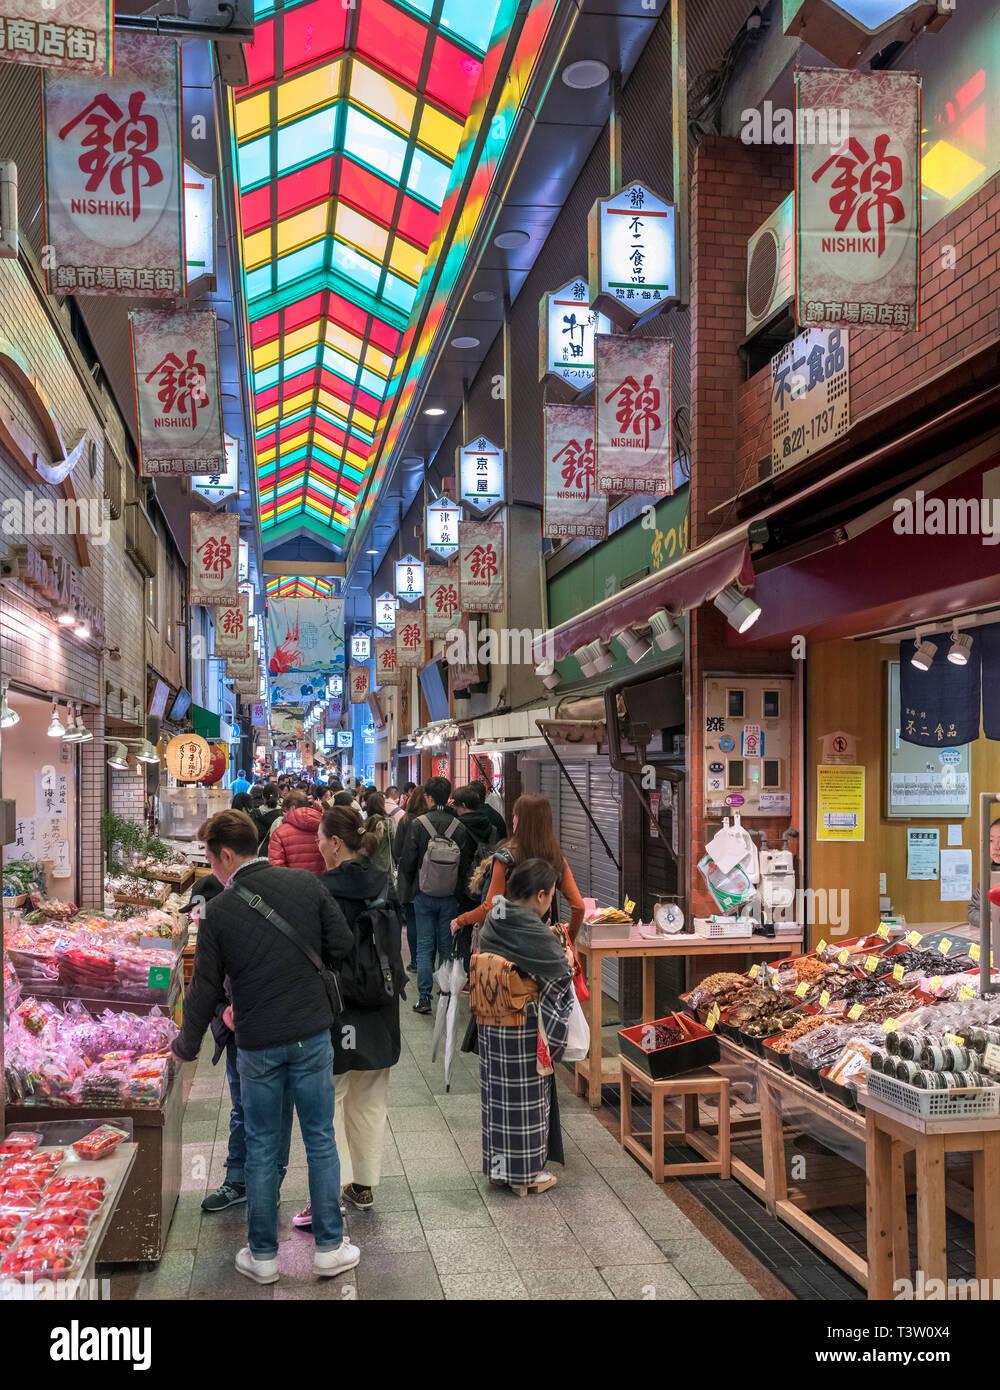 Stalls In Nishiki Market Kyoto Japan Stock Photo Alamy